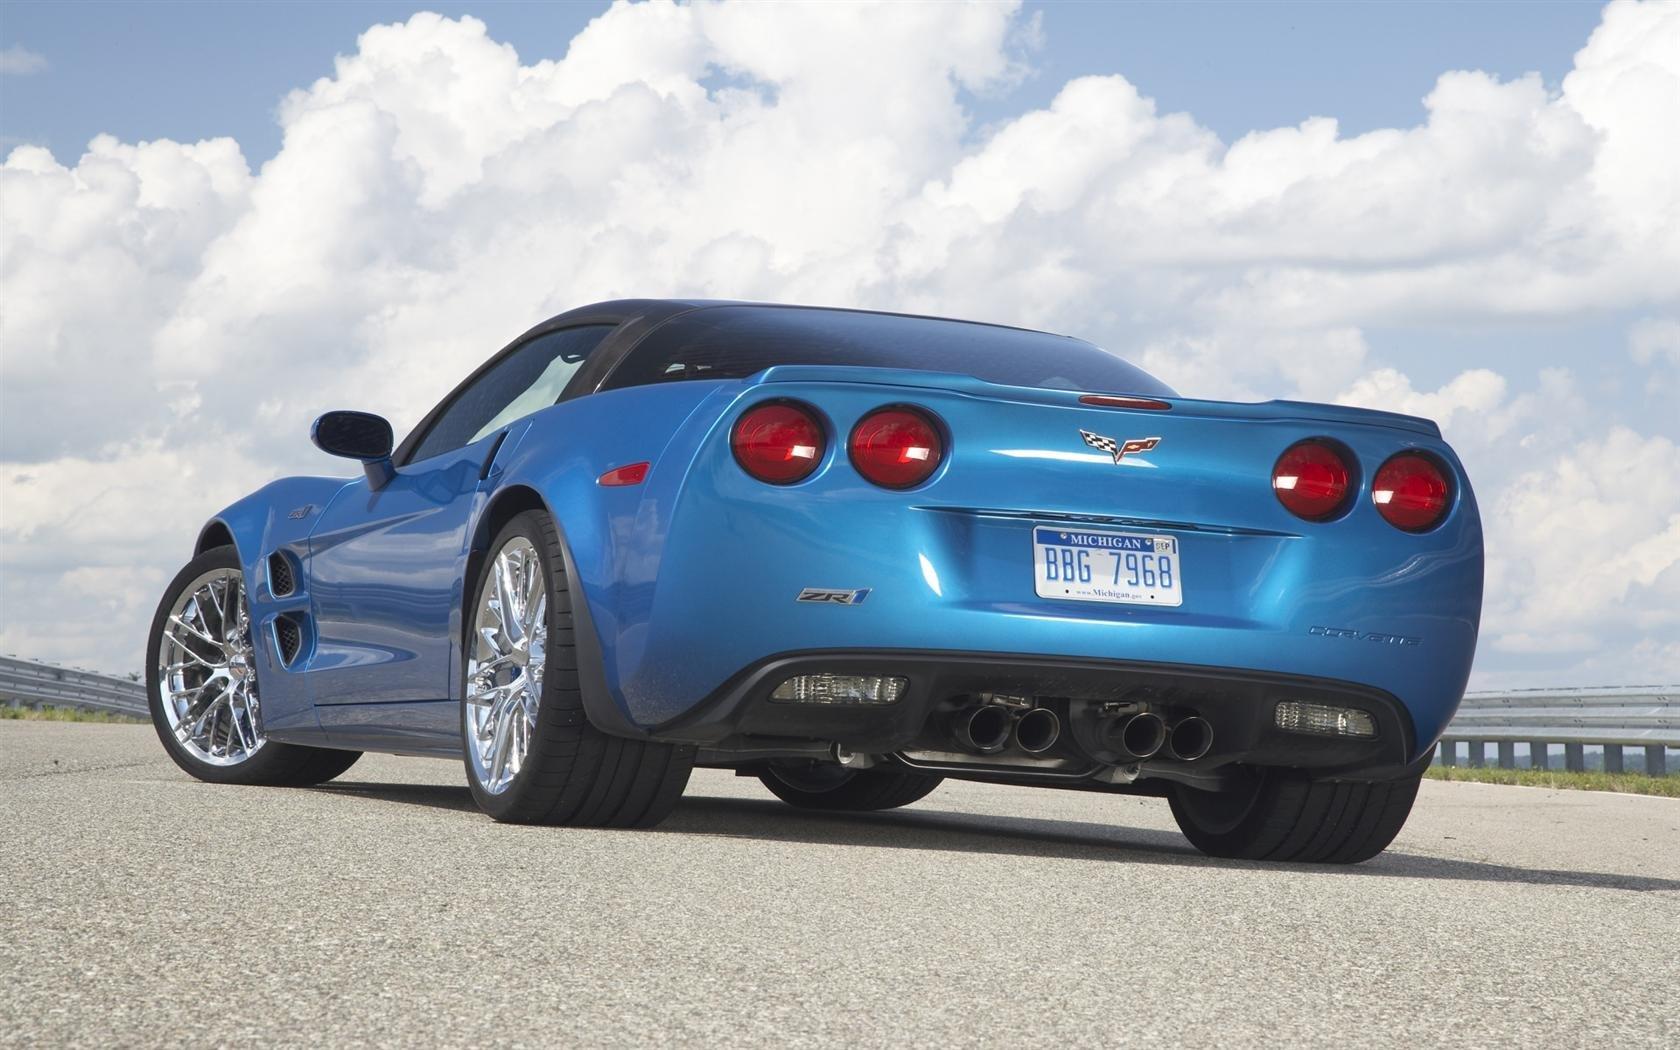 Топ-менеджерGM разбил самый мощный Chevrolet Corvette